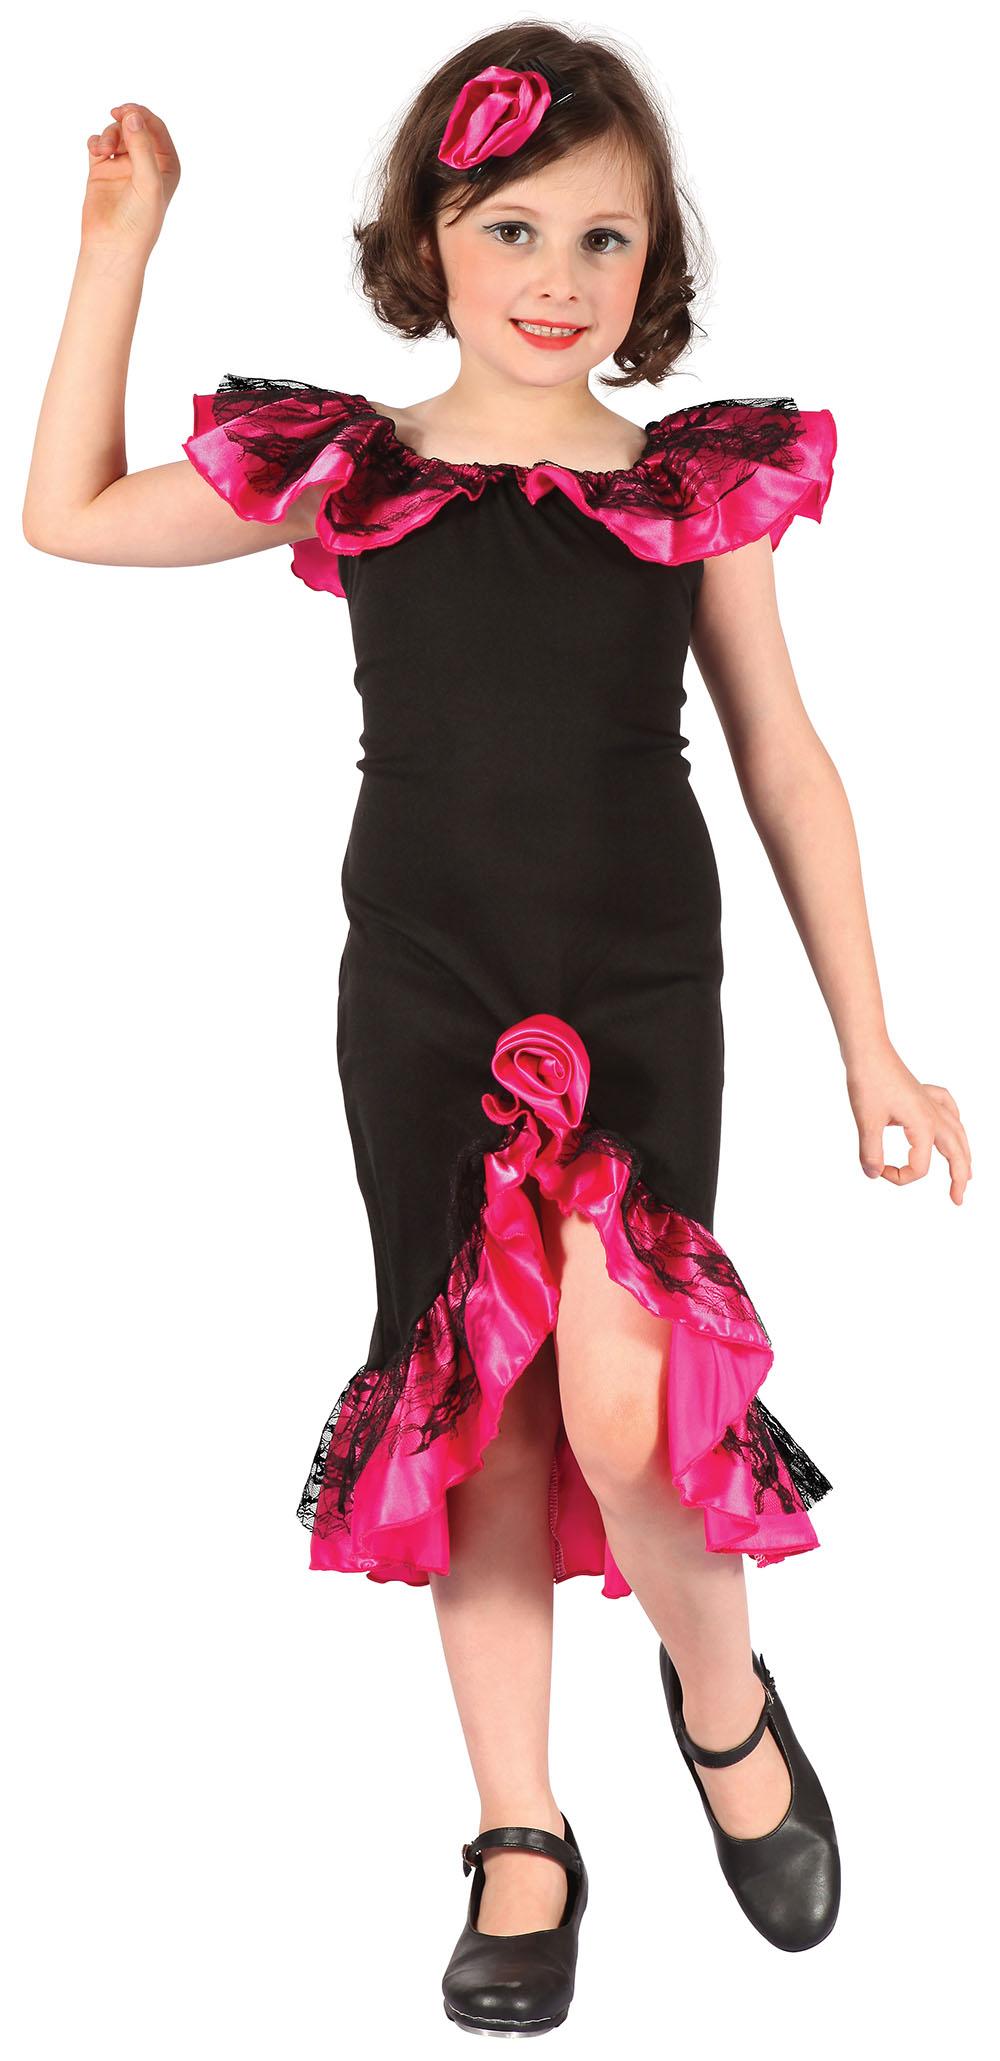 Childs Rumba Girl Black/Pink Costume Spain Spanish Latin American Fancy Dress | eBay